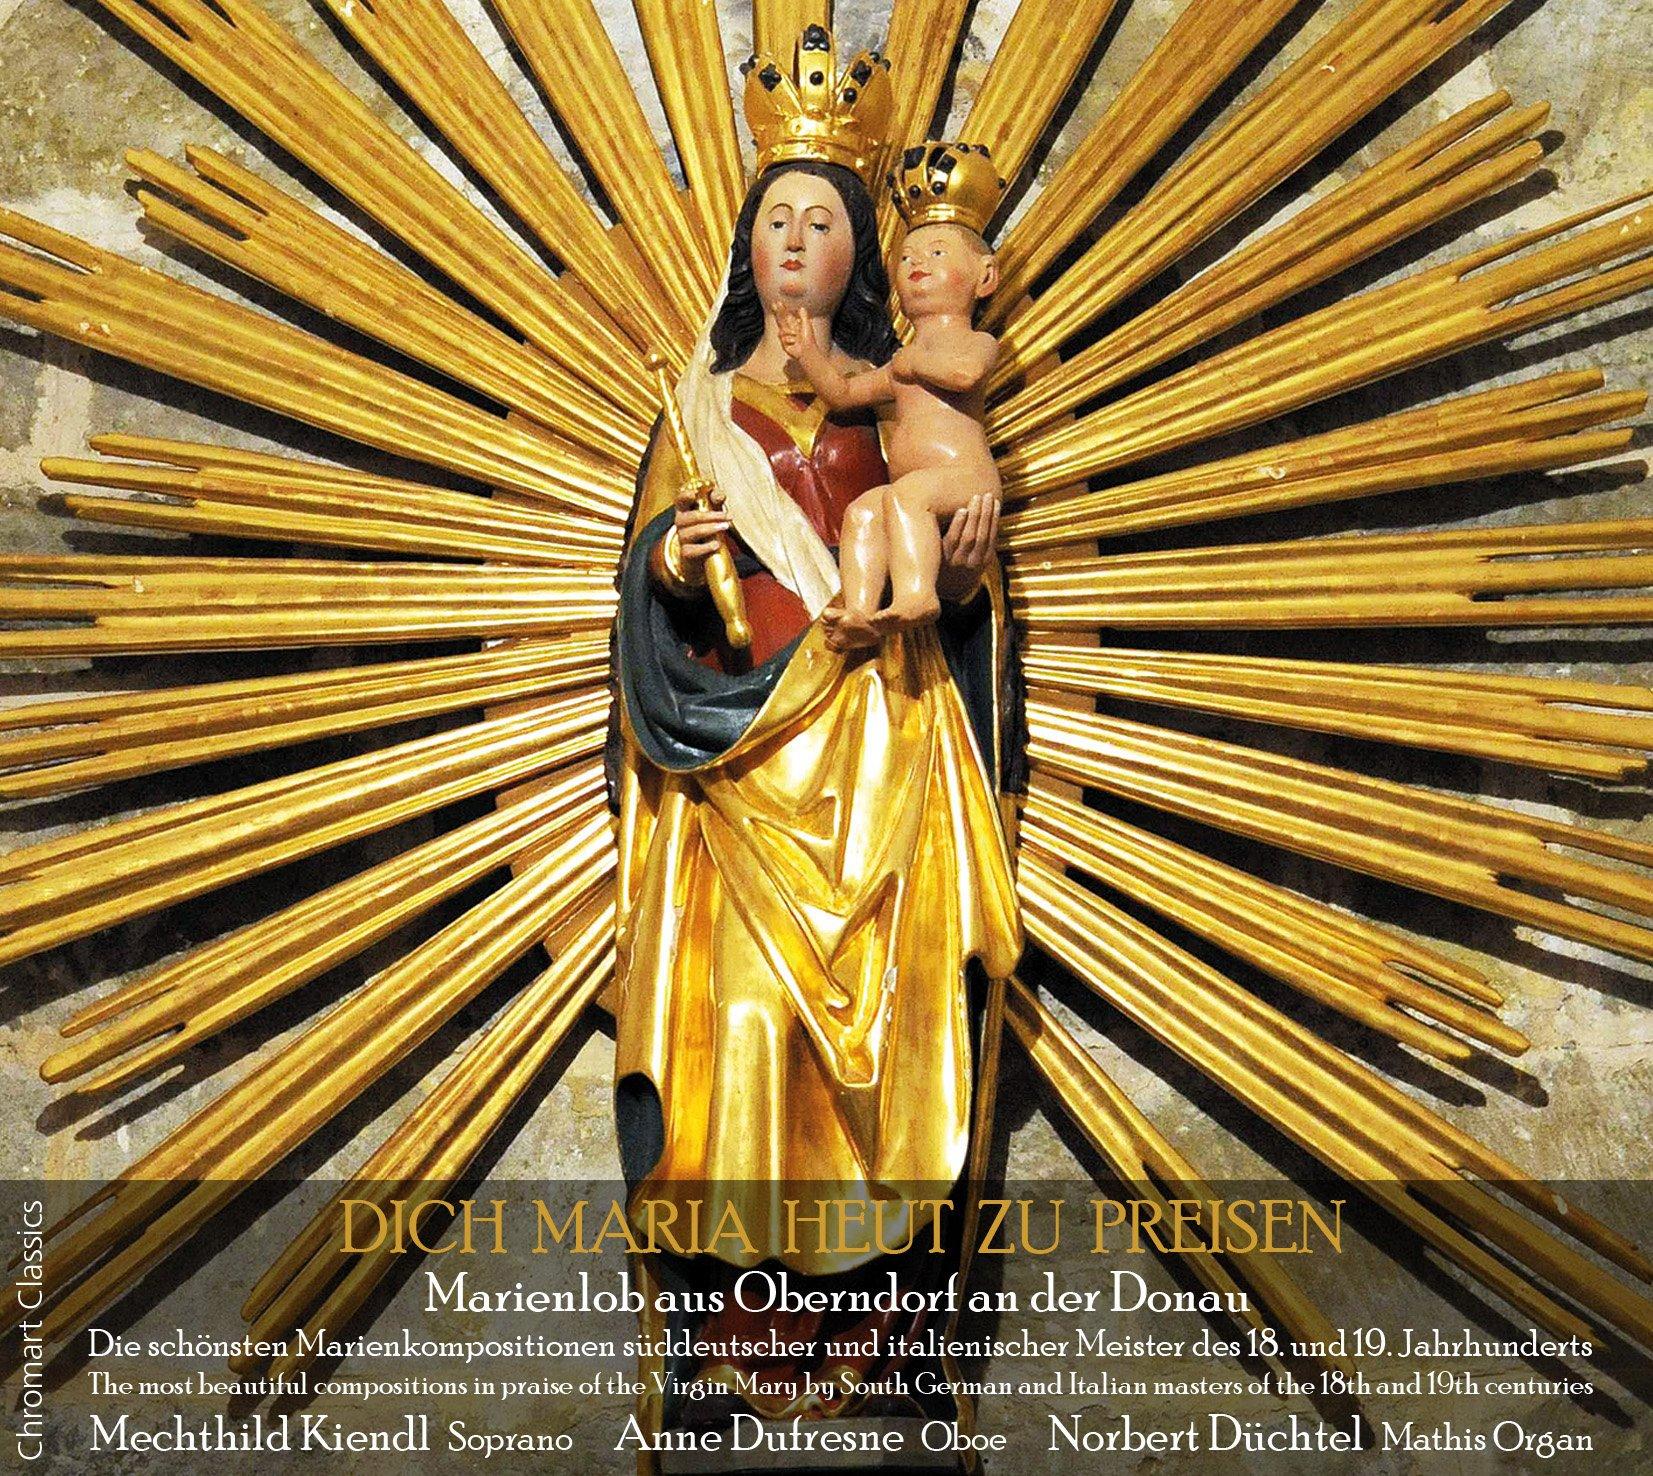 Dich Maria heut zu preisen - The most beautiful